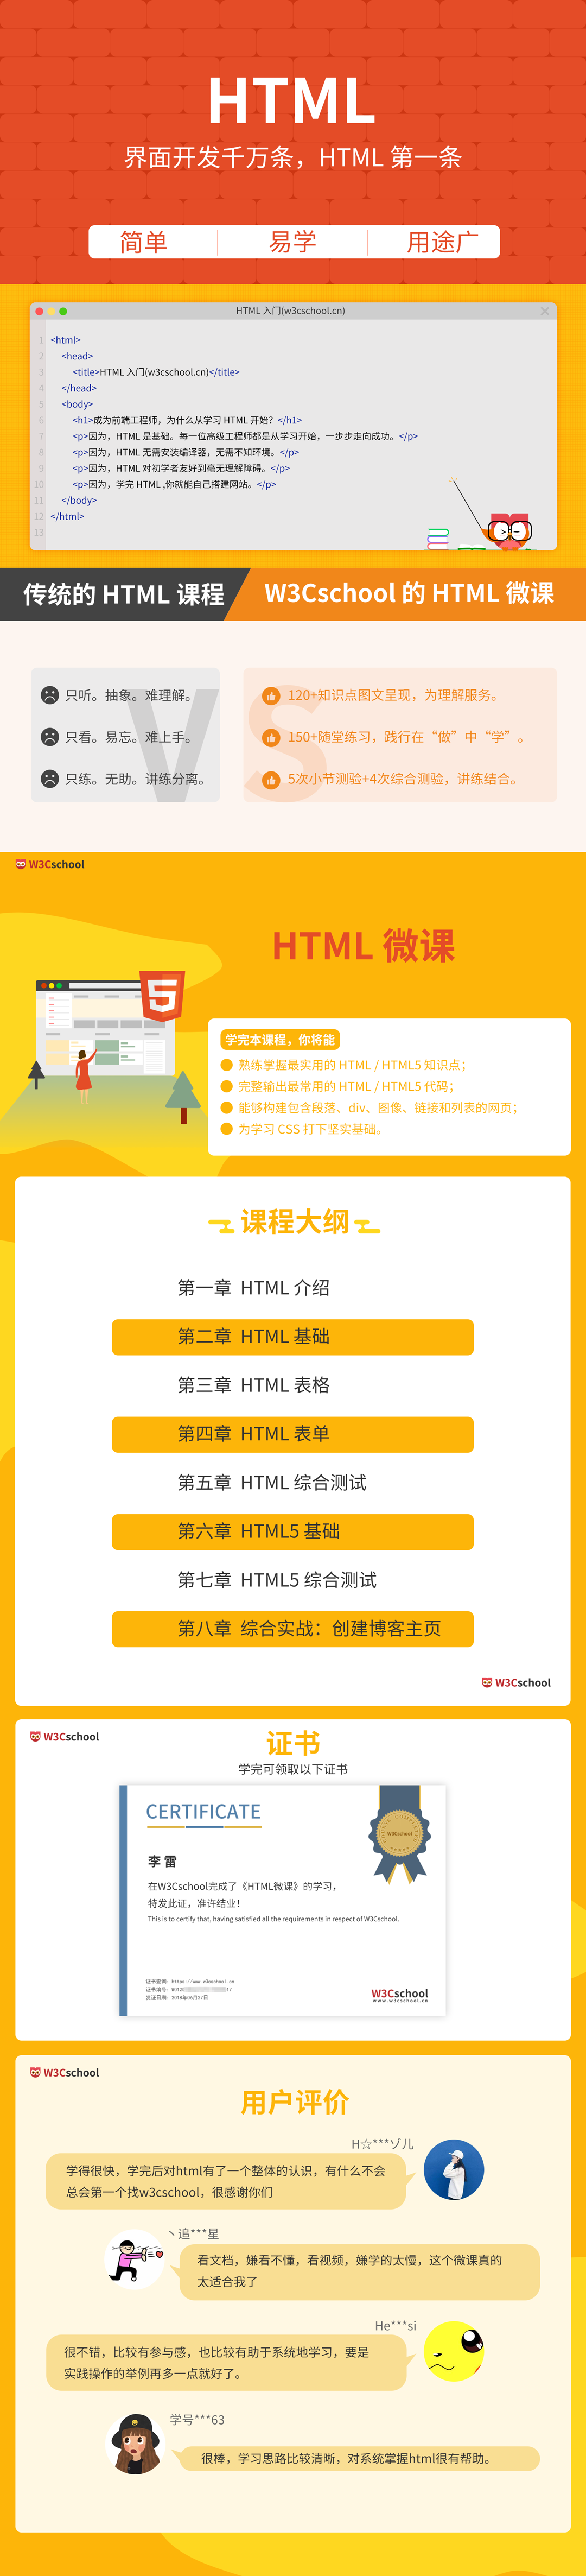 HTML微课课程介绍3